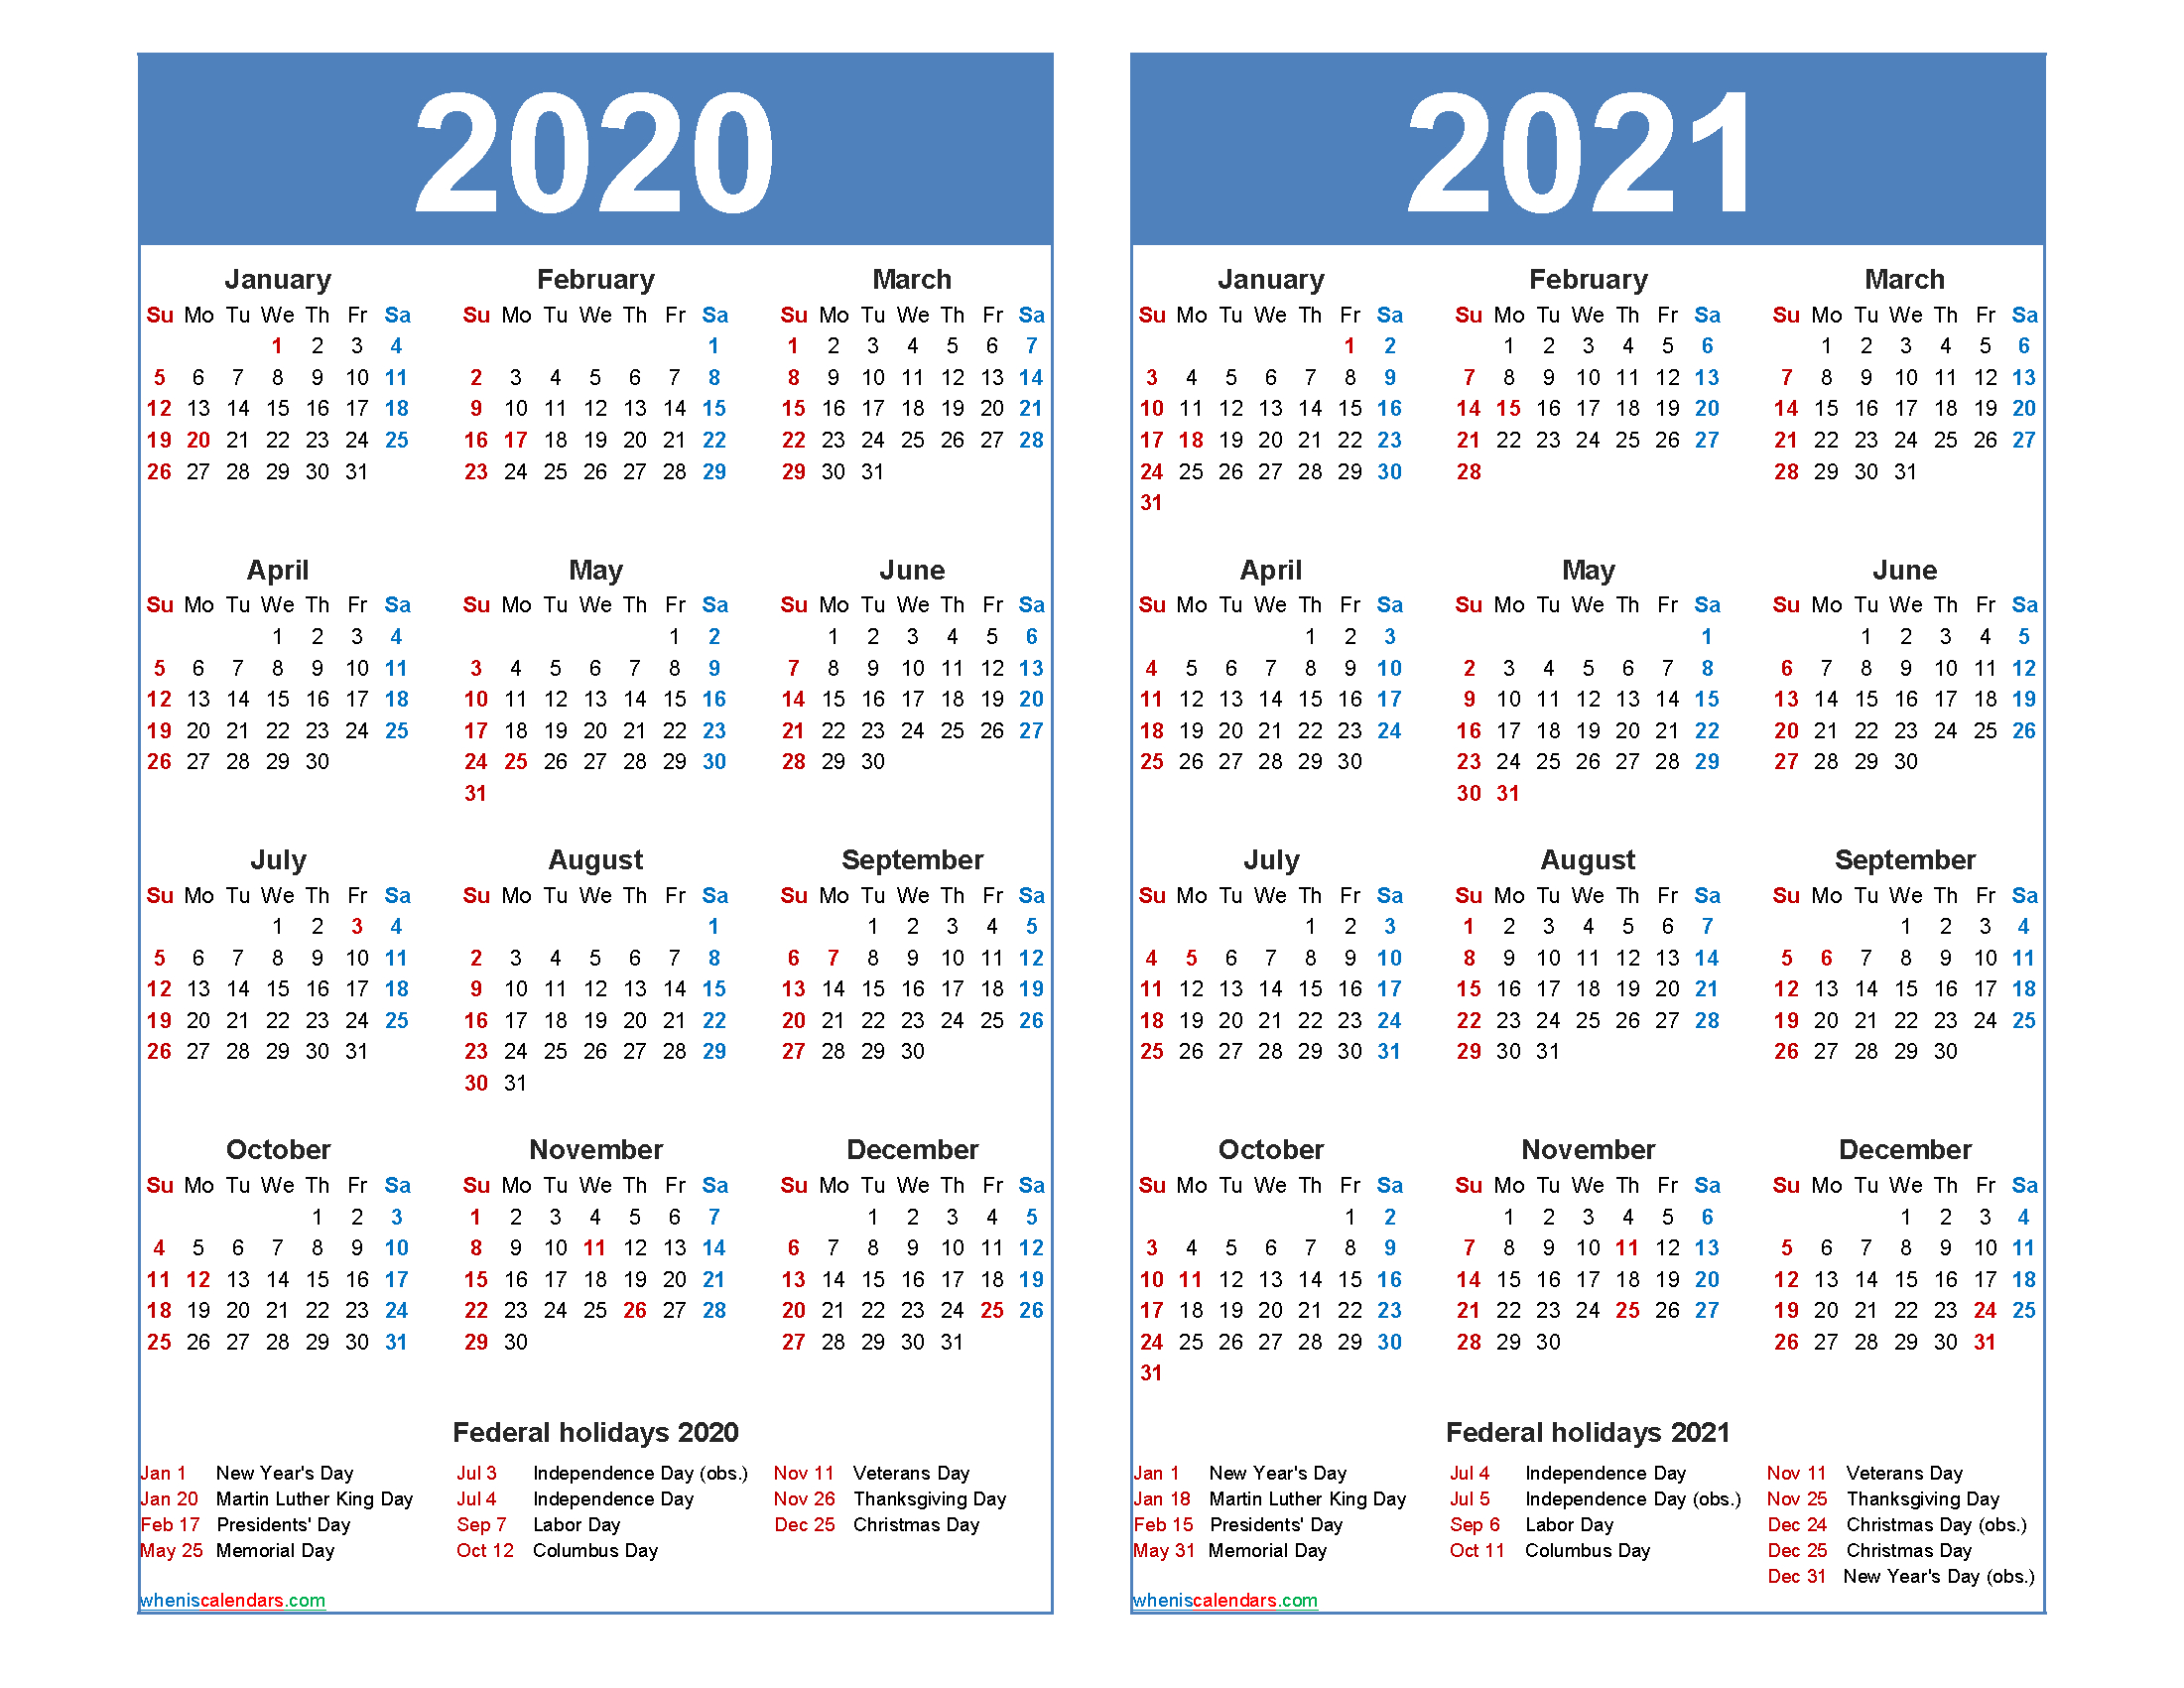 Free 2020 2021 Calendar Printable With Holidays - Free